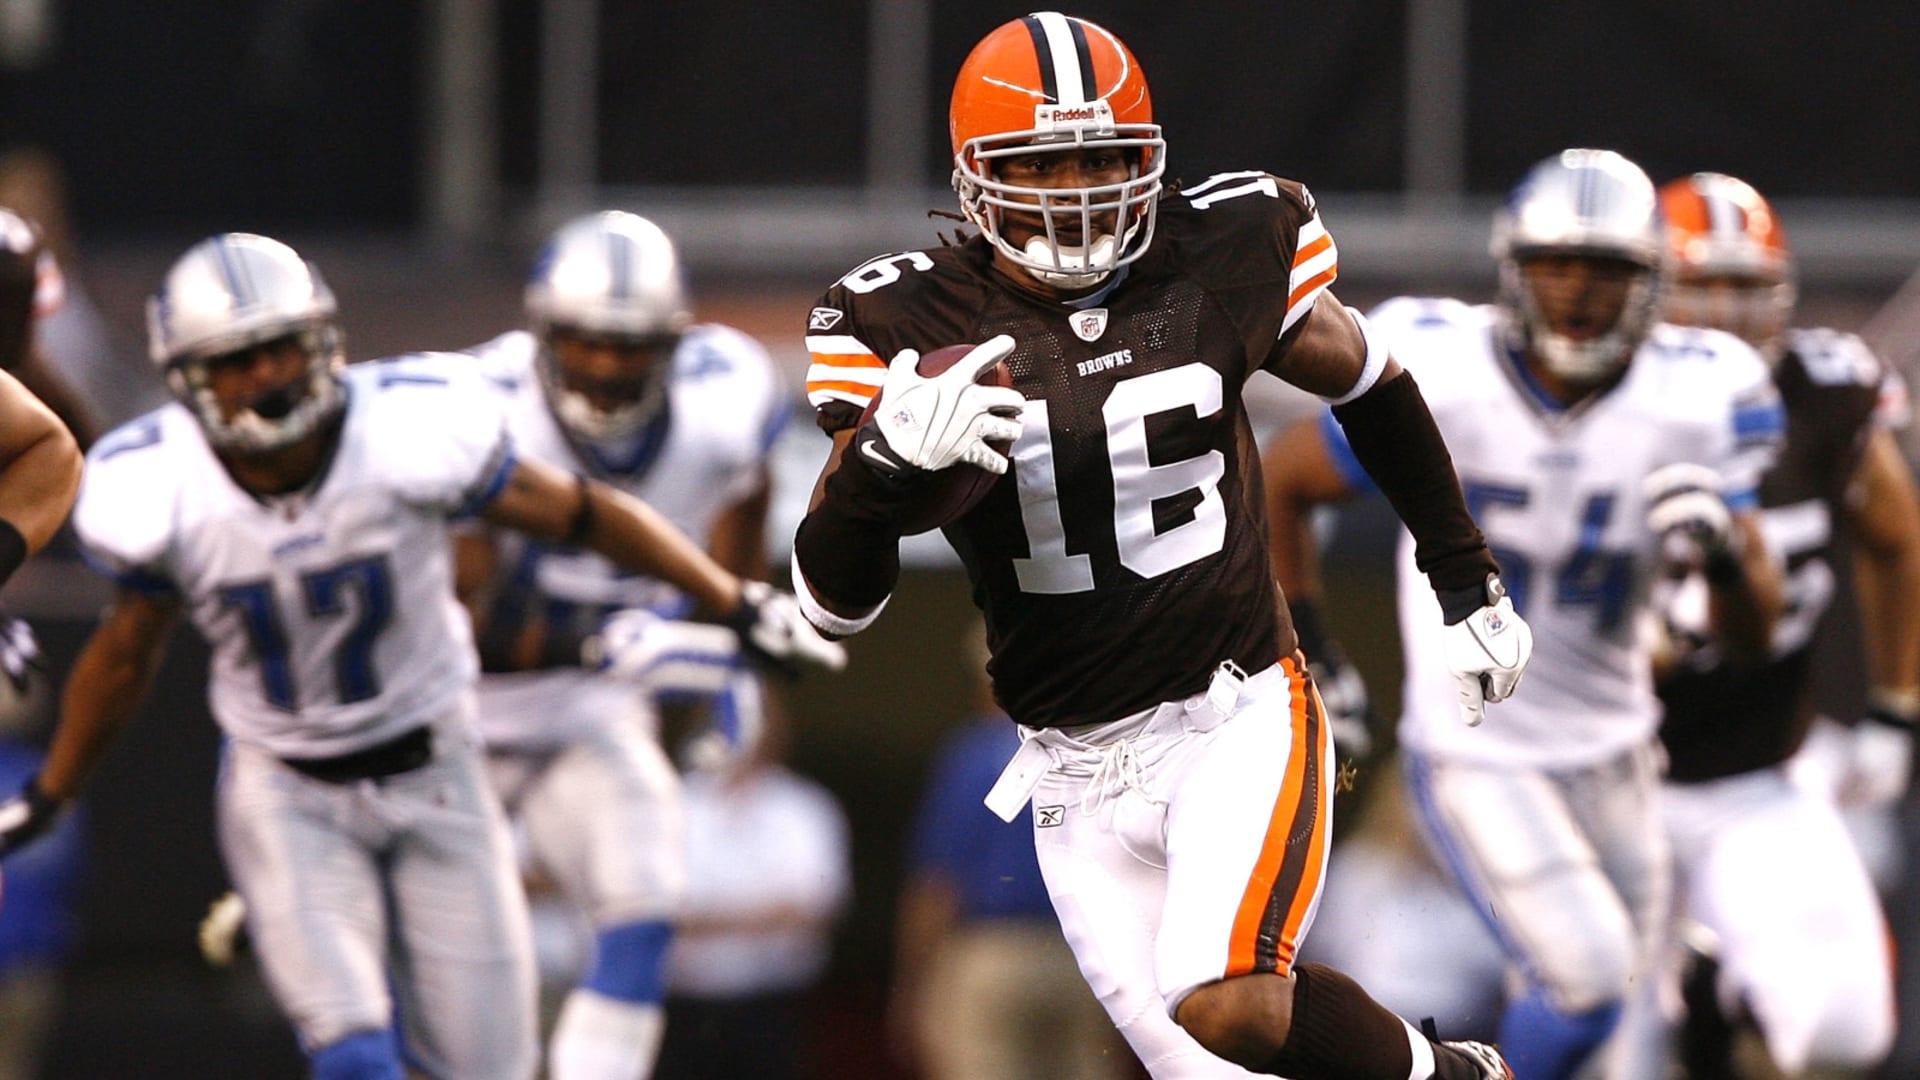 Flashback: Top 3 games of Josh Cribbs Cleveland Browns career